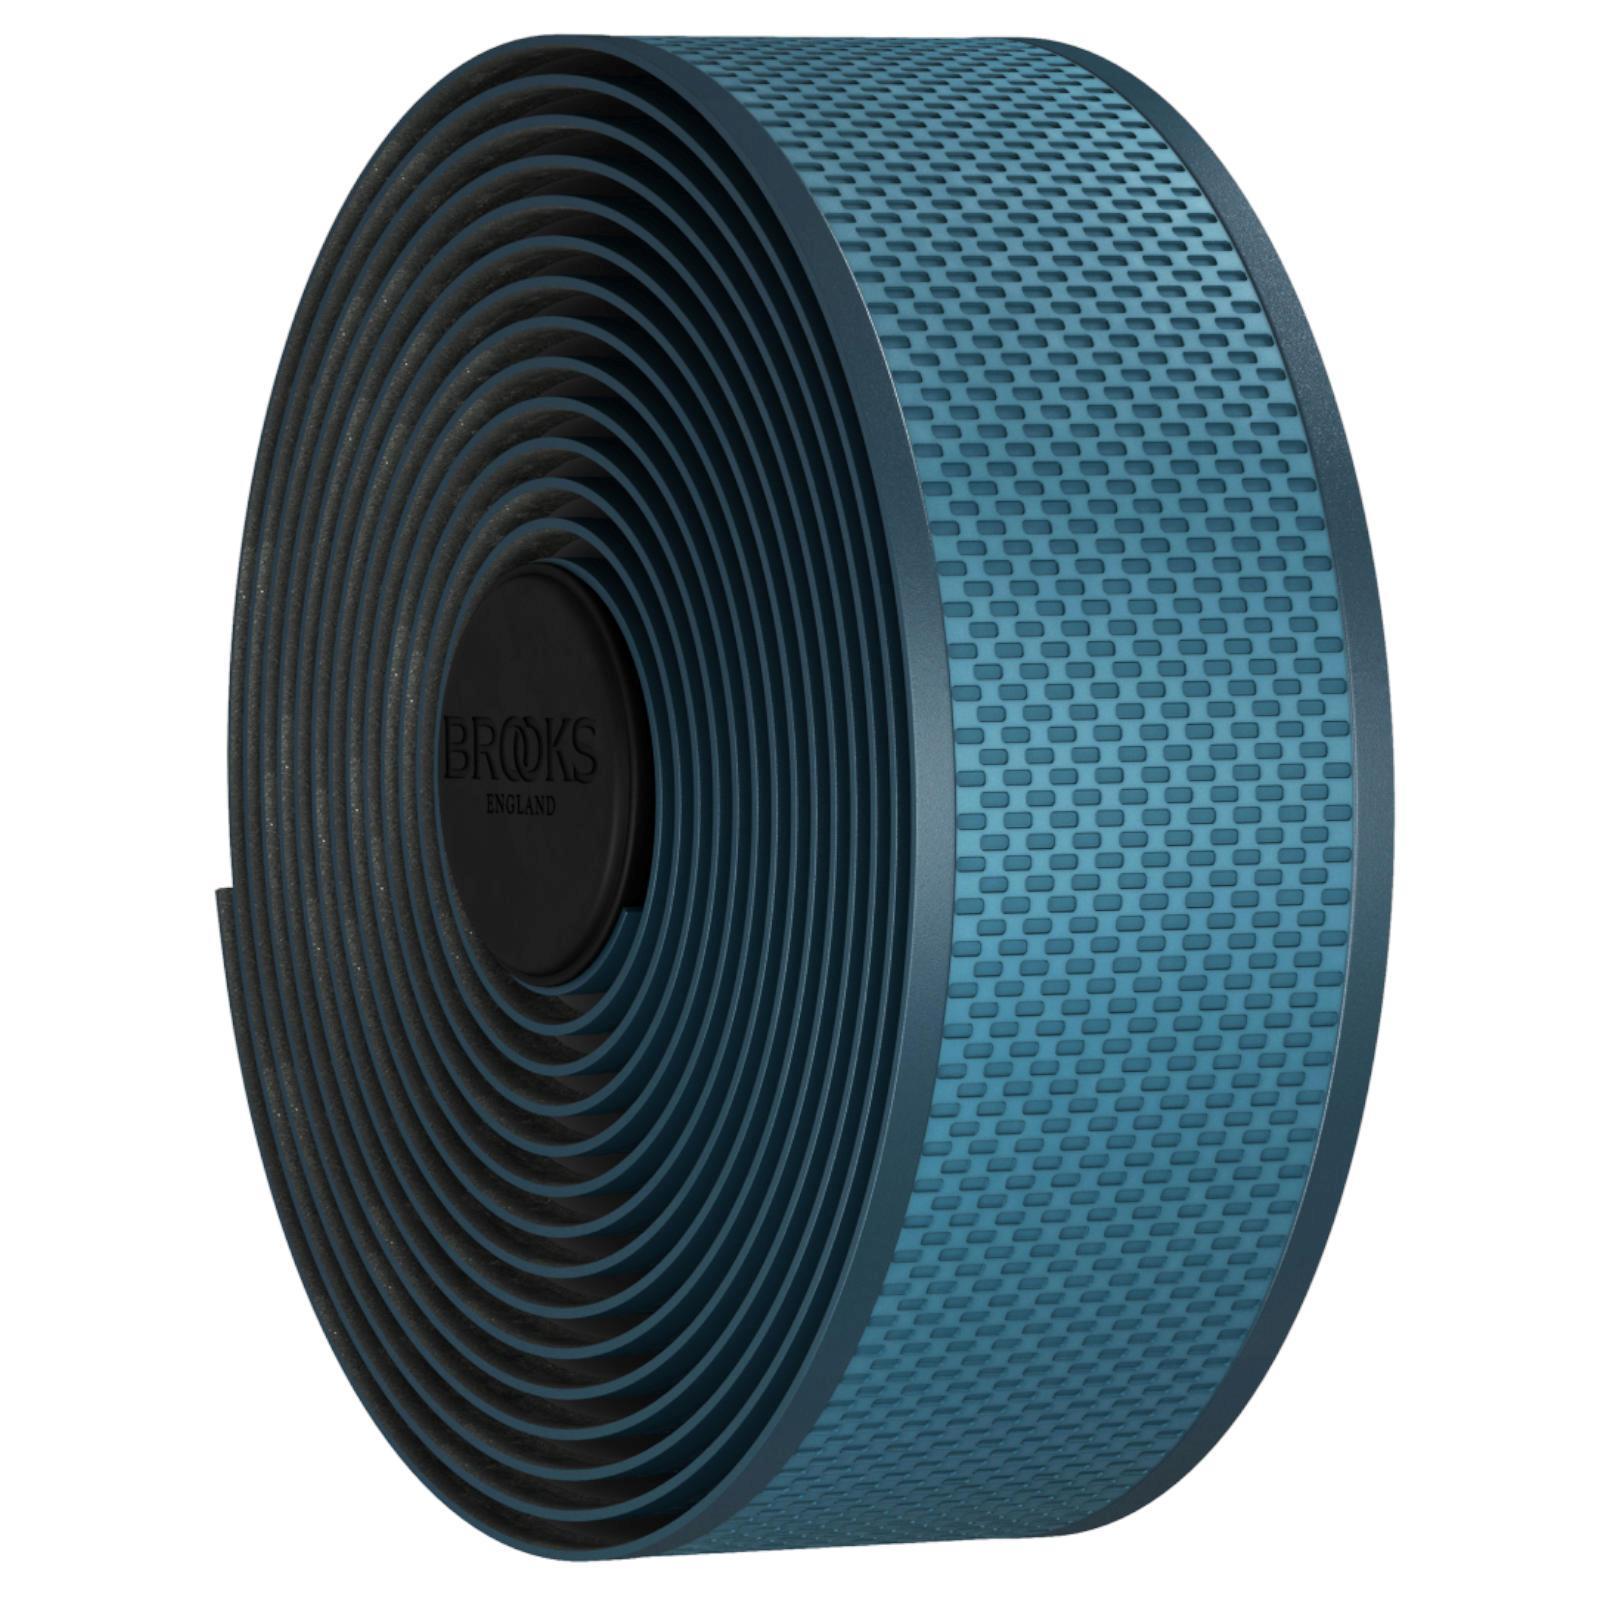 Brooks Cambium Rubber Bar Tape Octane Blue C17